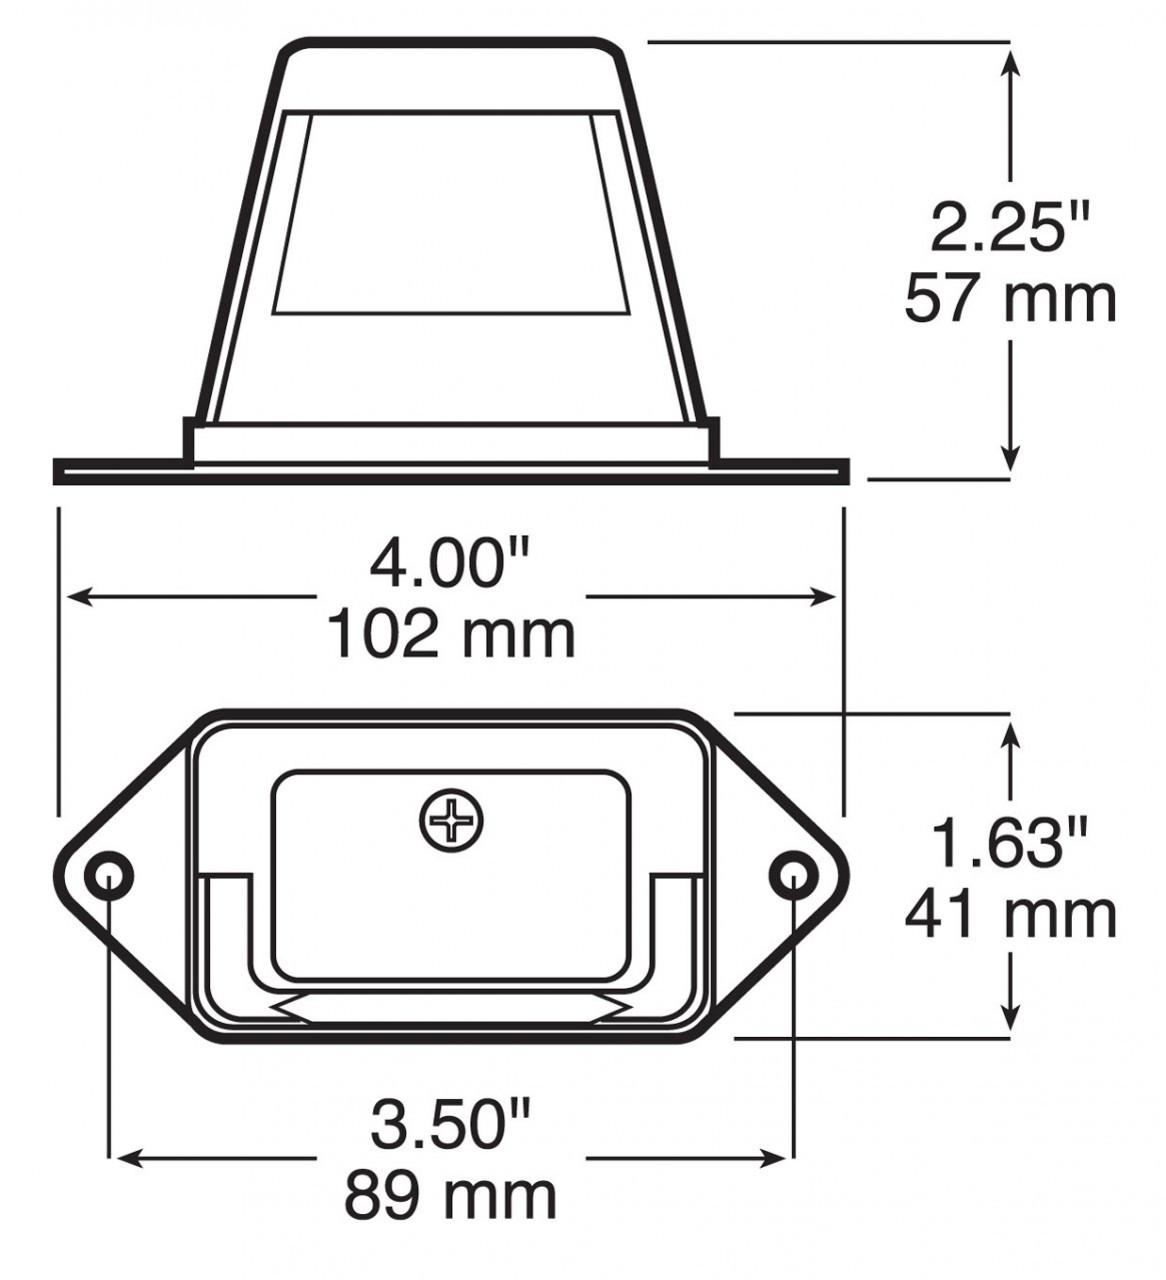 LED296C2 --- LED Licence Plate Light - 2 Diodes